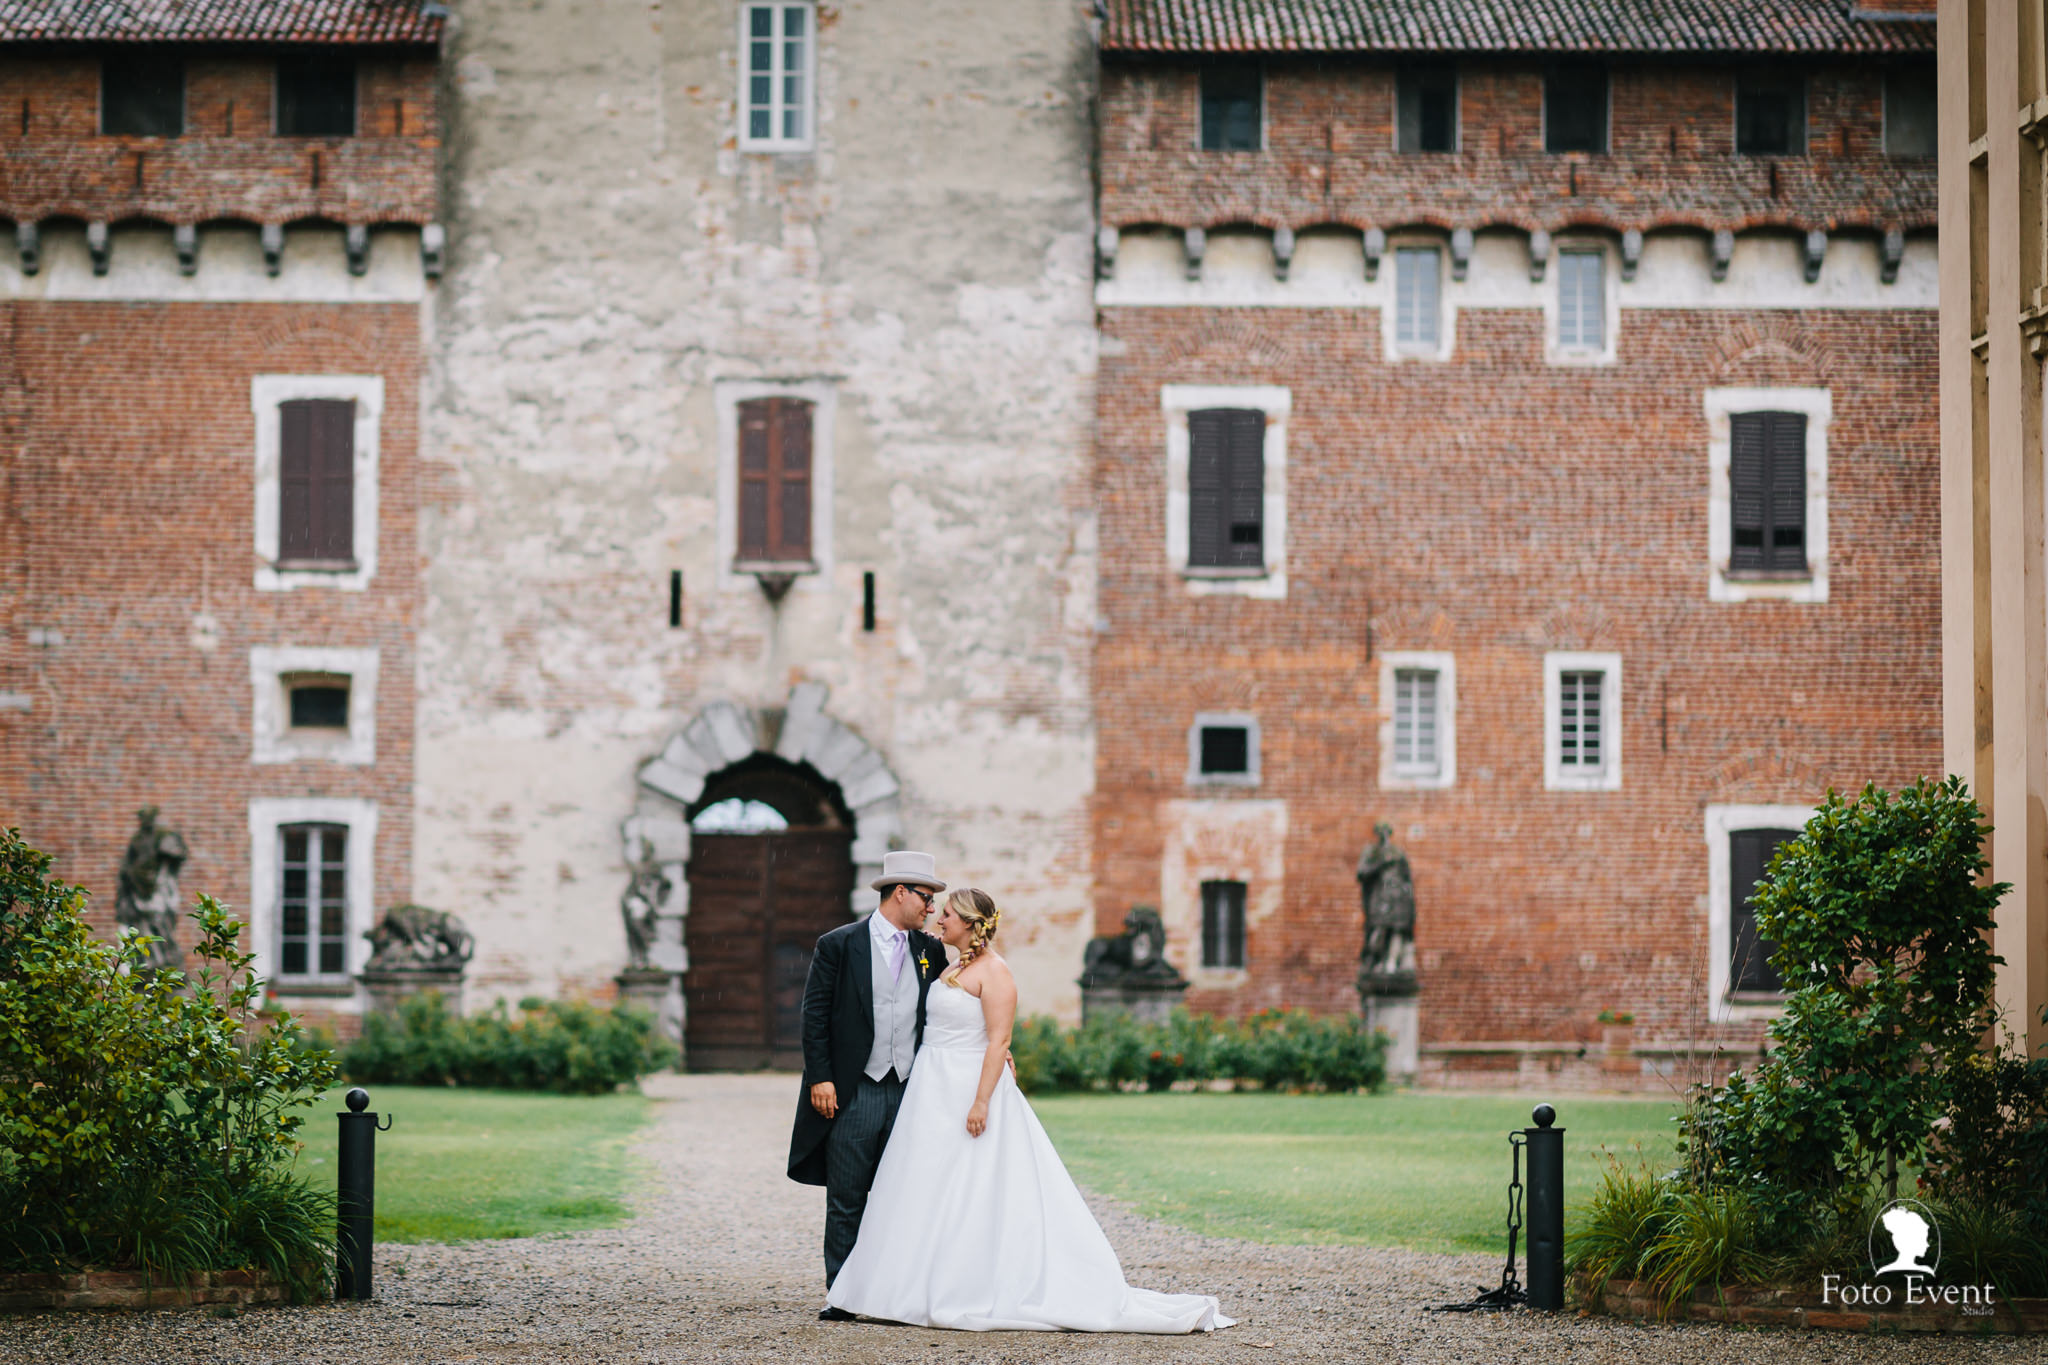 066-2019-07-27-Matrimonio-Valentina-e-Alessandro-Pettinari-80mm-412